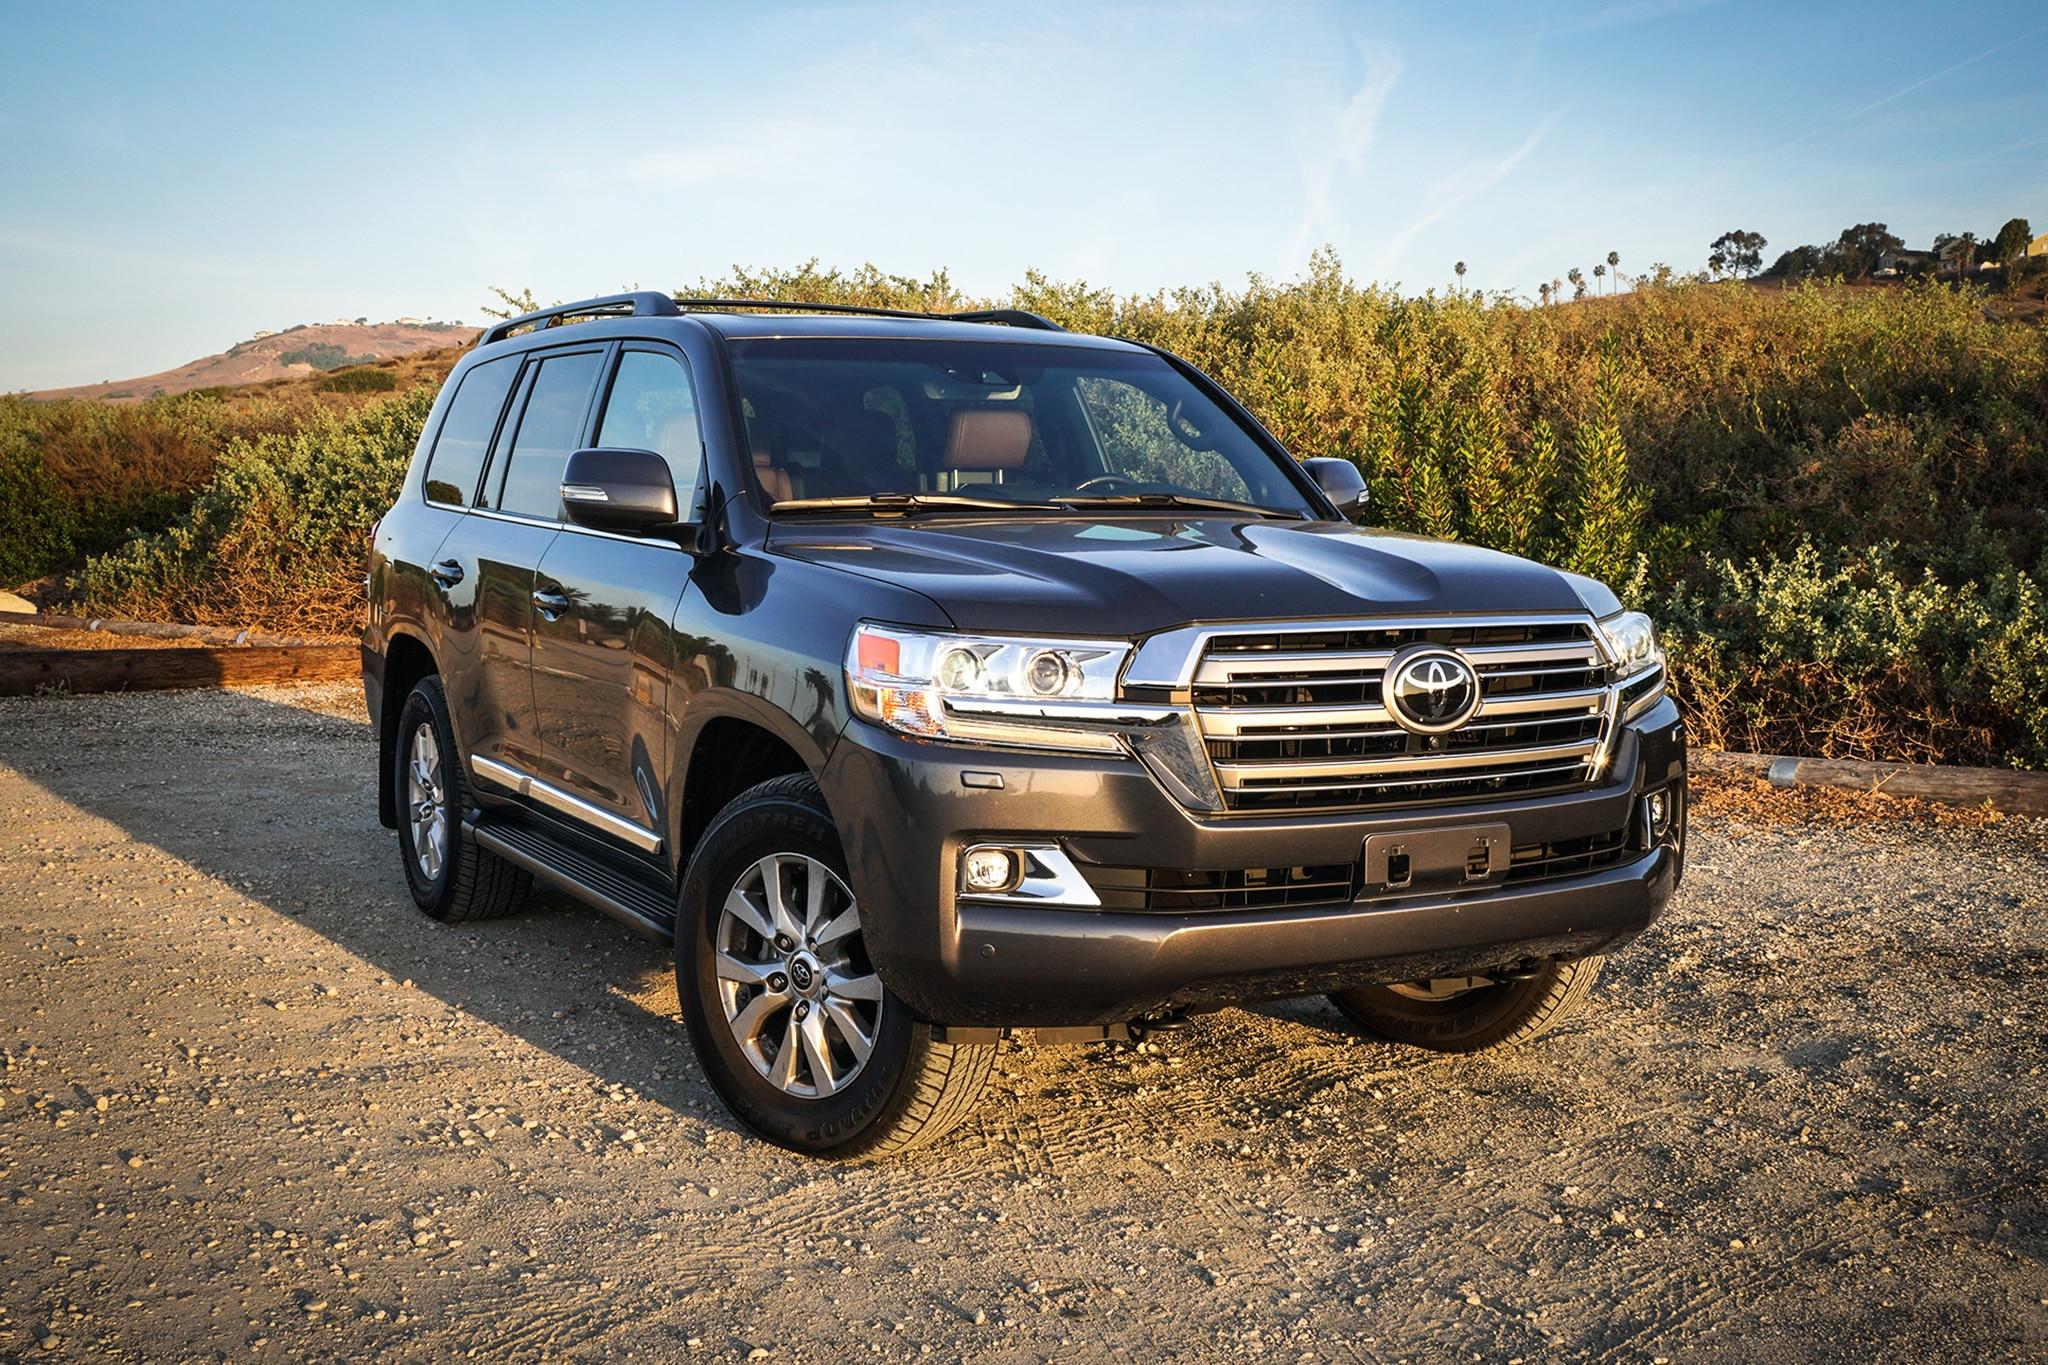 2018 Toyota Land Cruiser Front Three Quarter 02